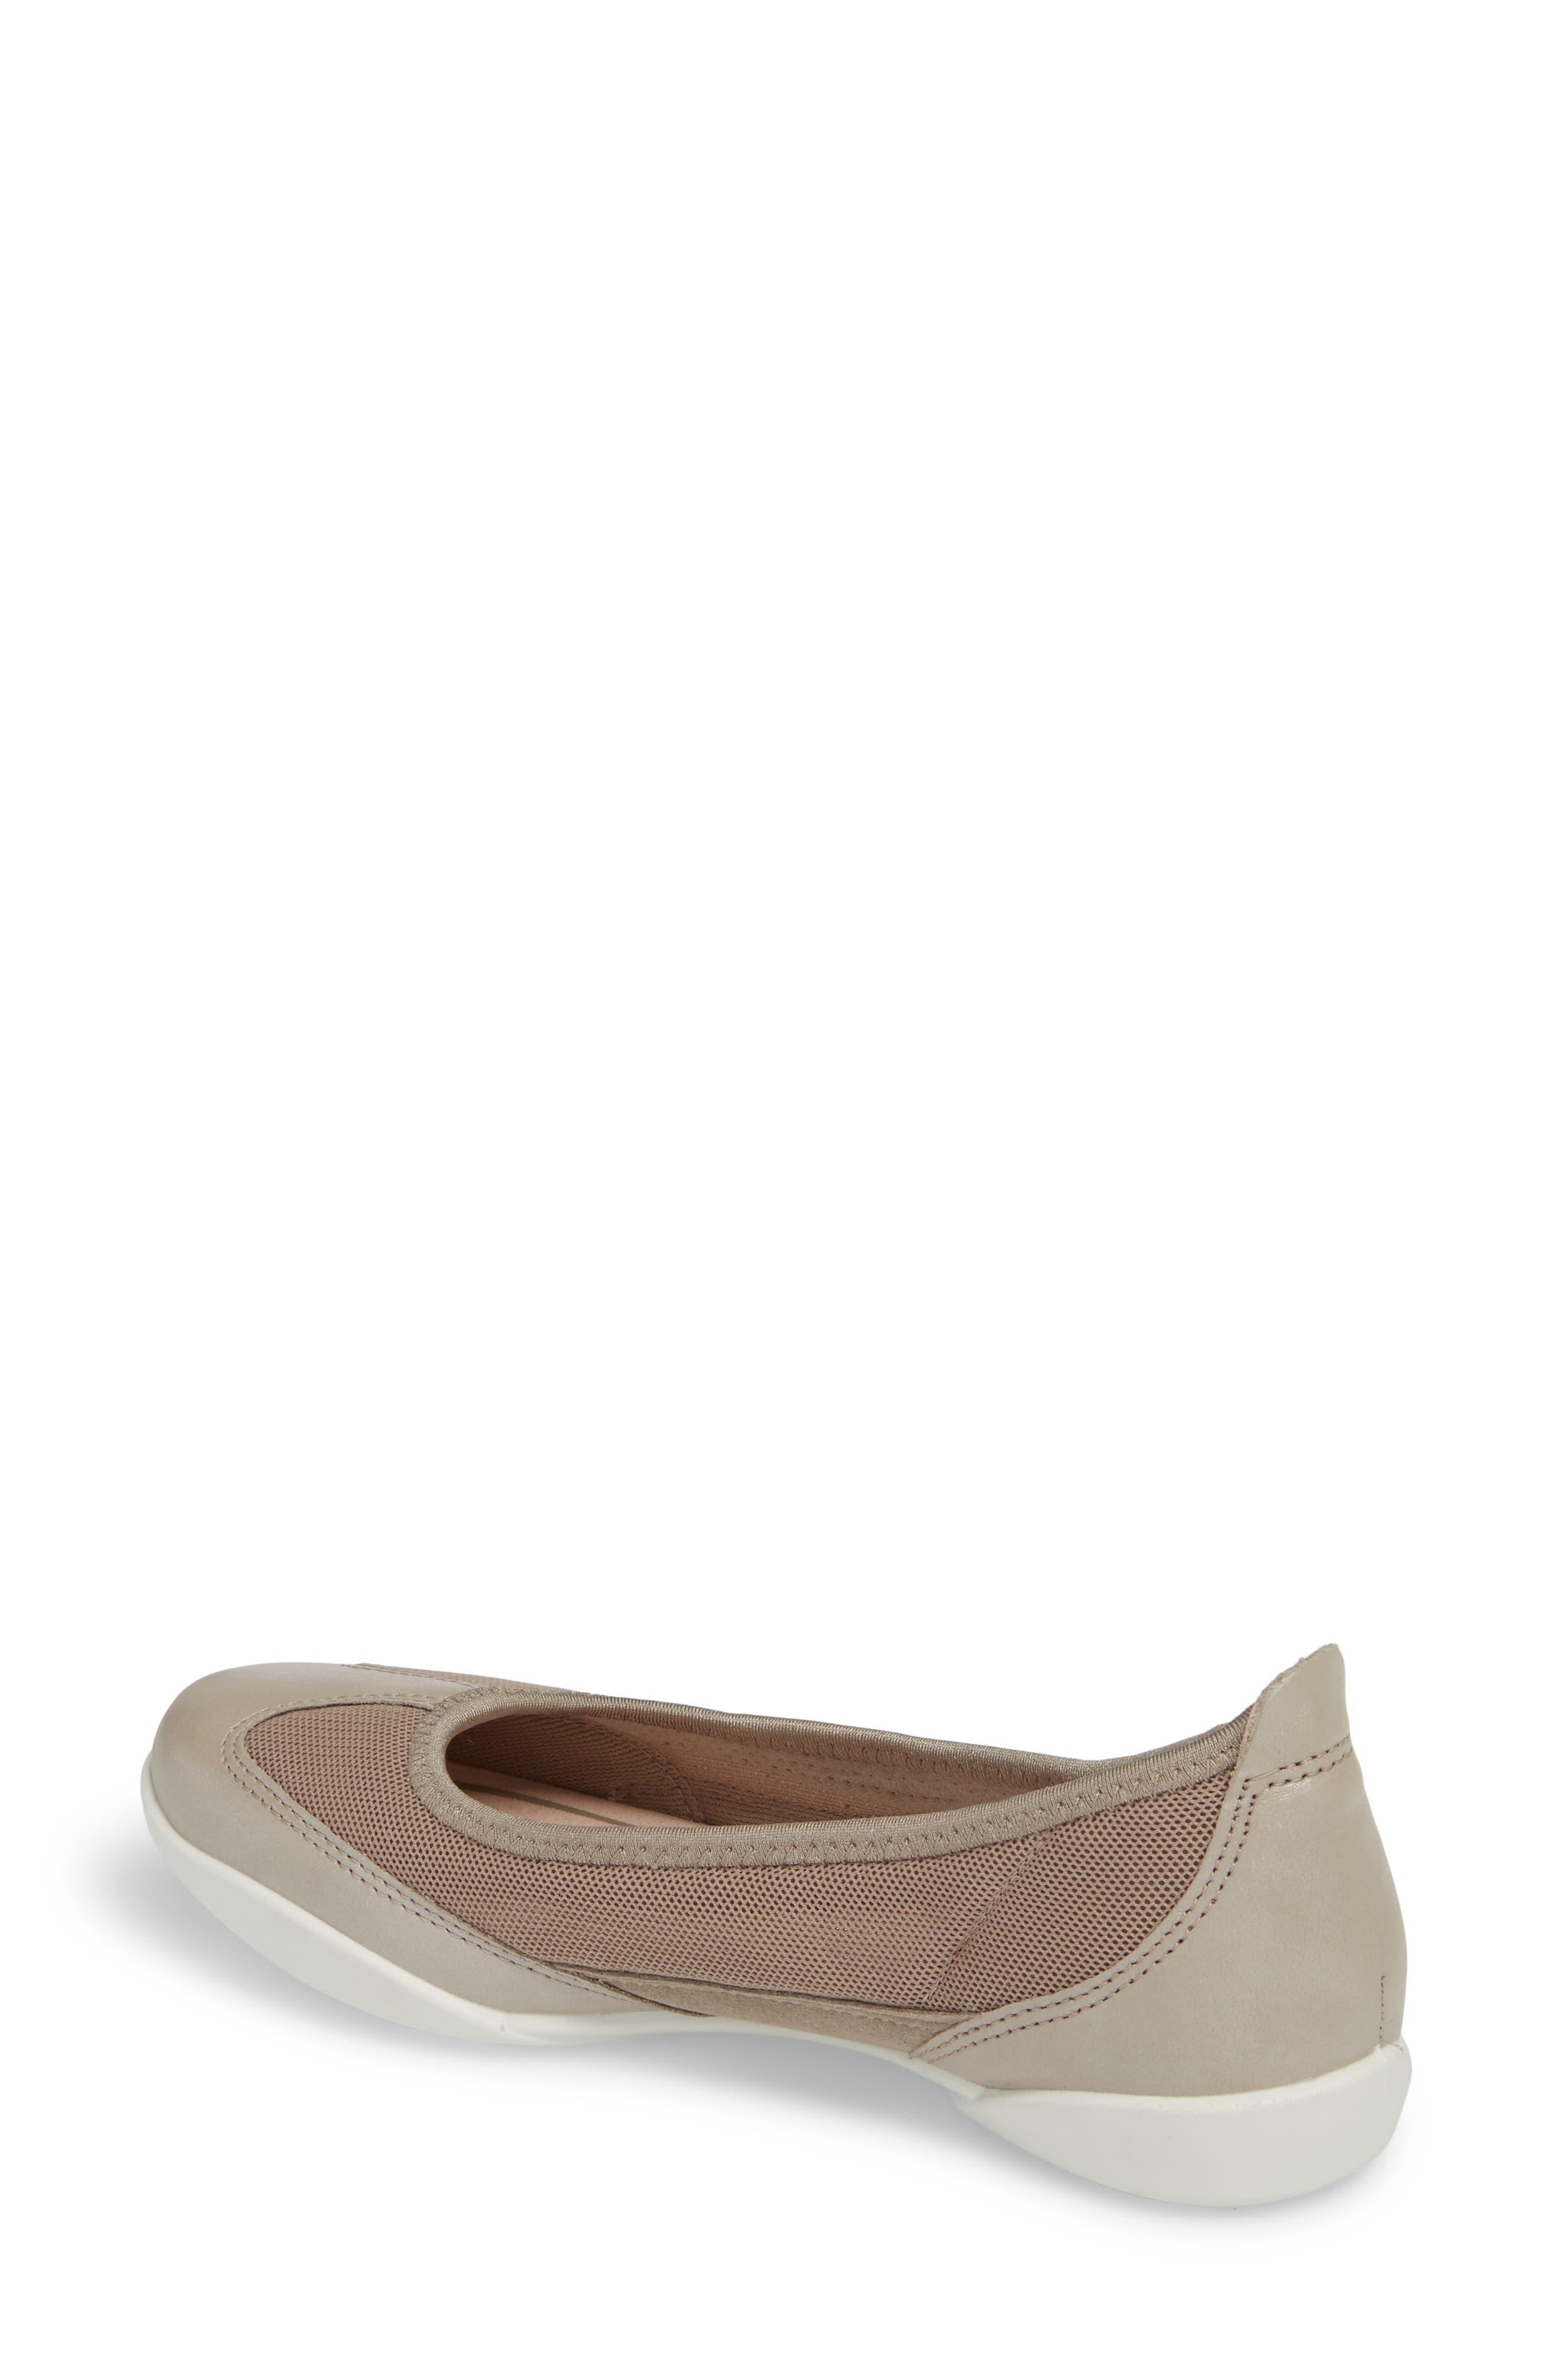 Alternate Image 2  - ECCO 'Bluma' Ballet Sneaker (Women)